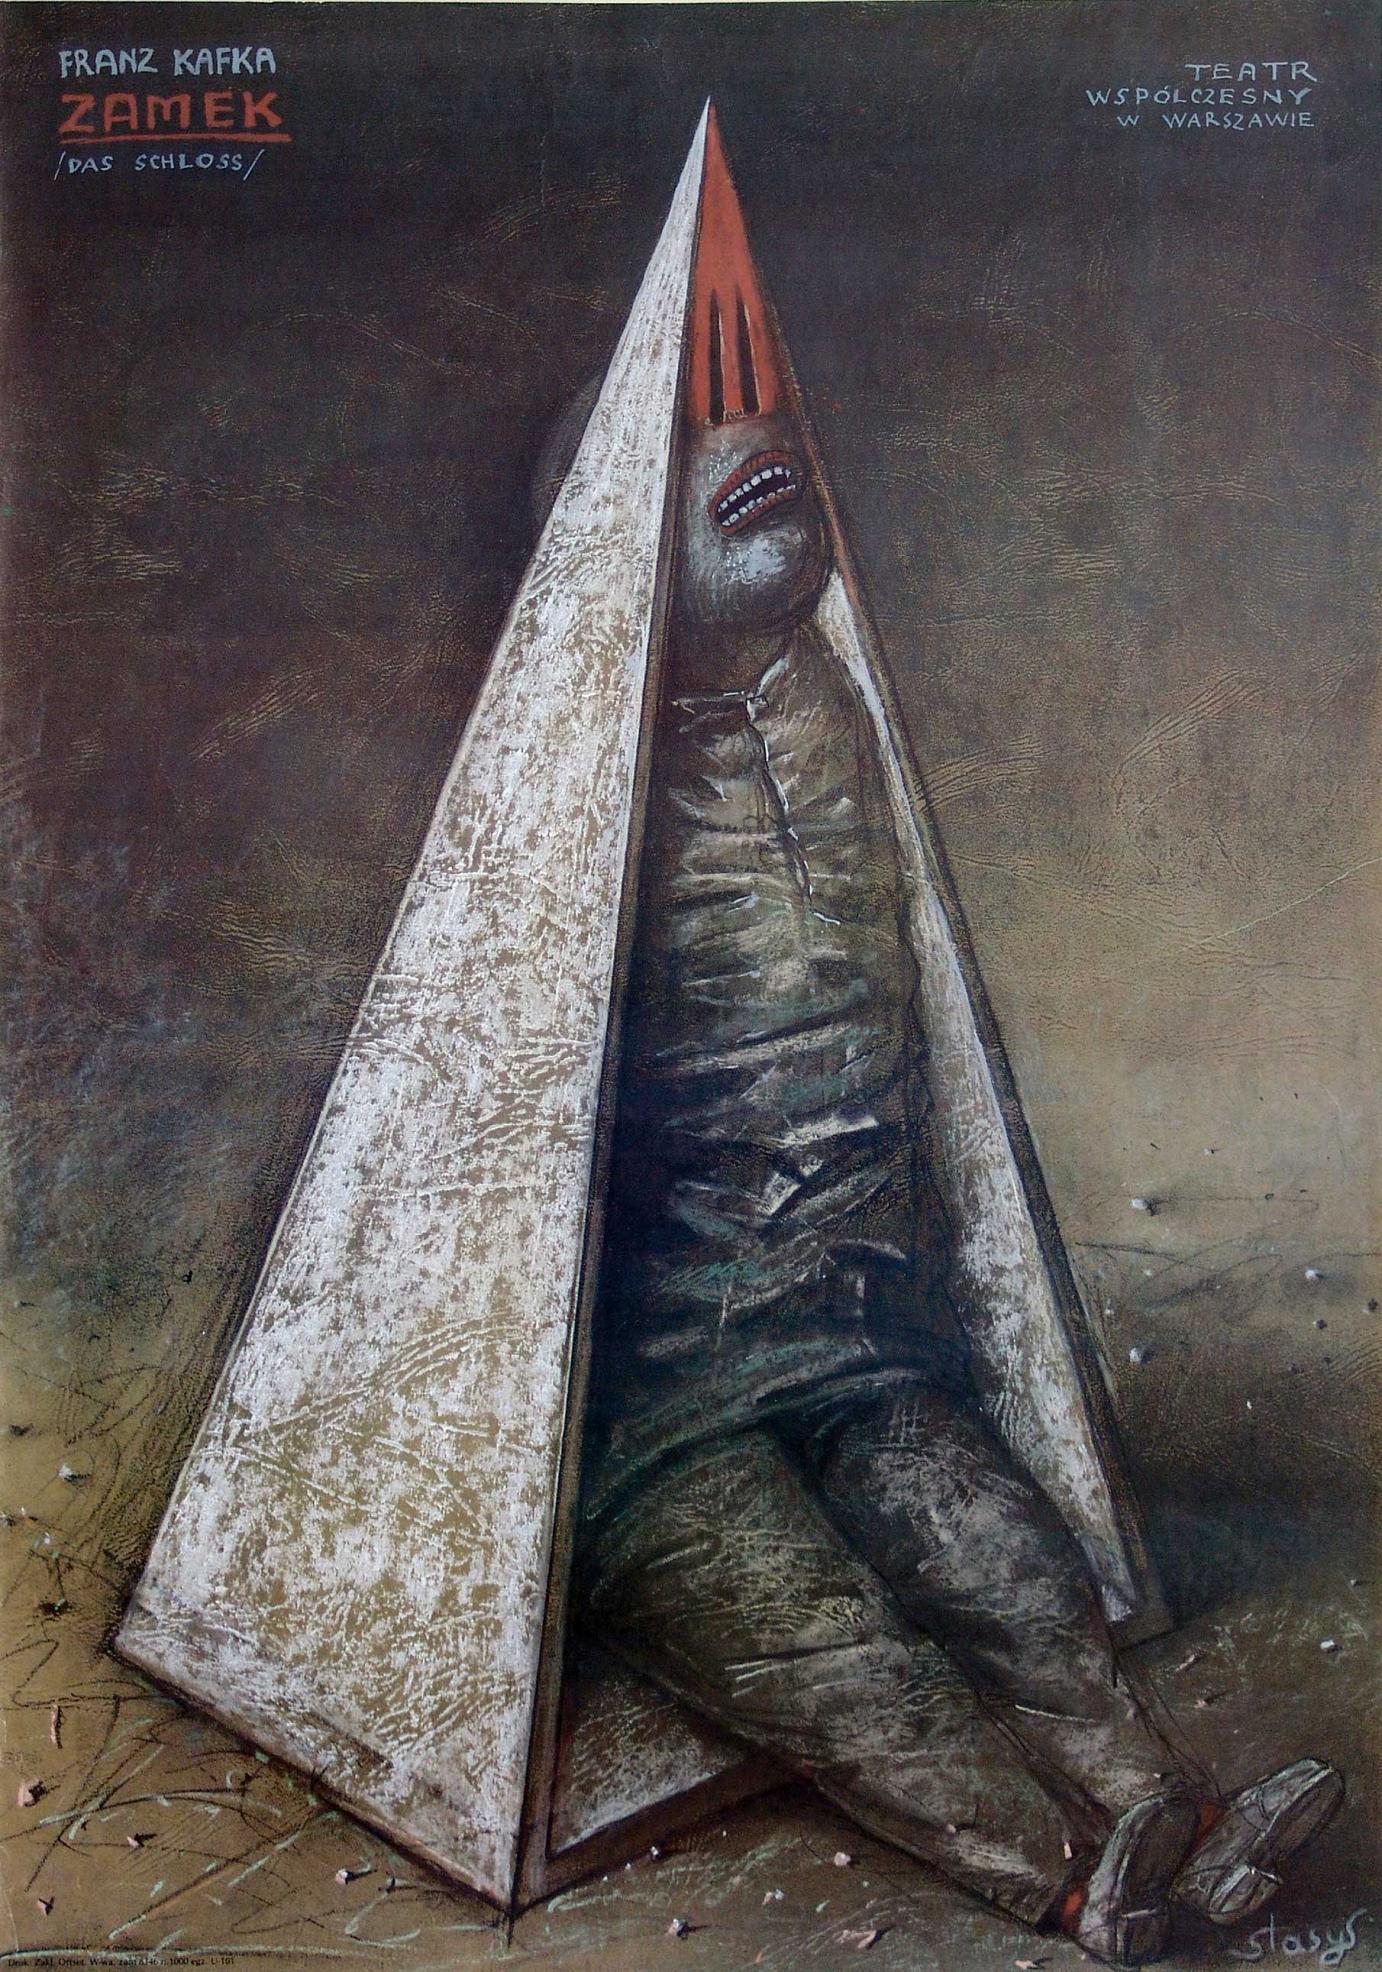 Stasys Eidrigevicius »Zamek« (1987)